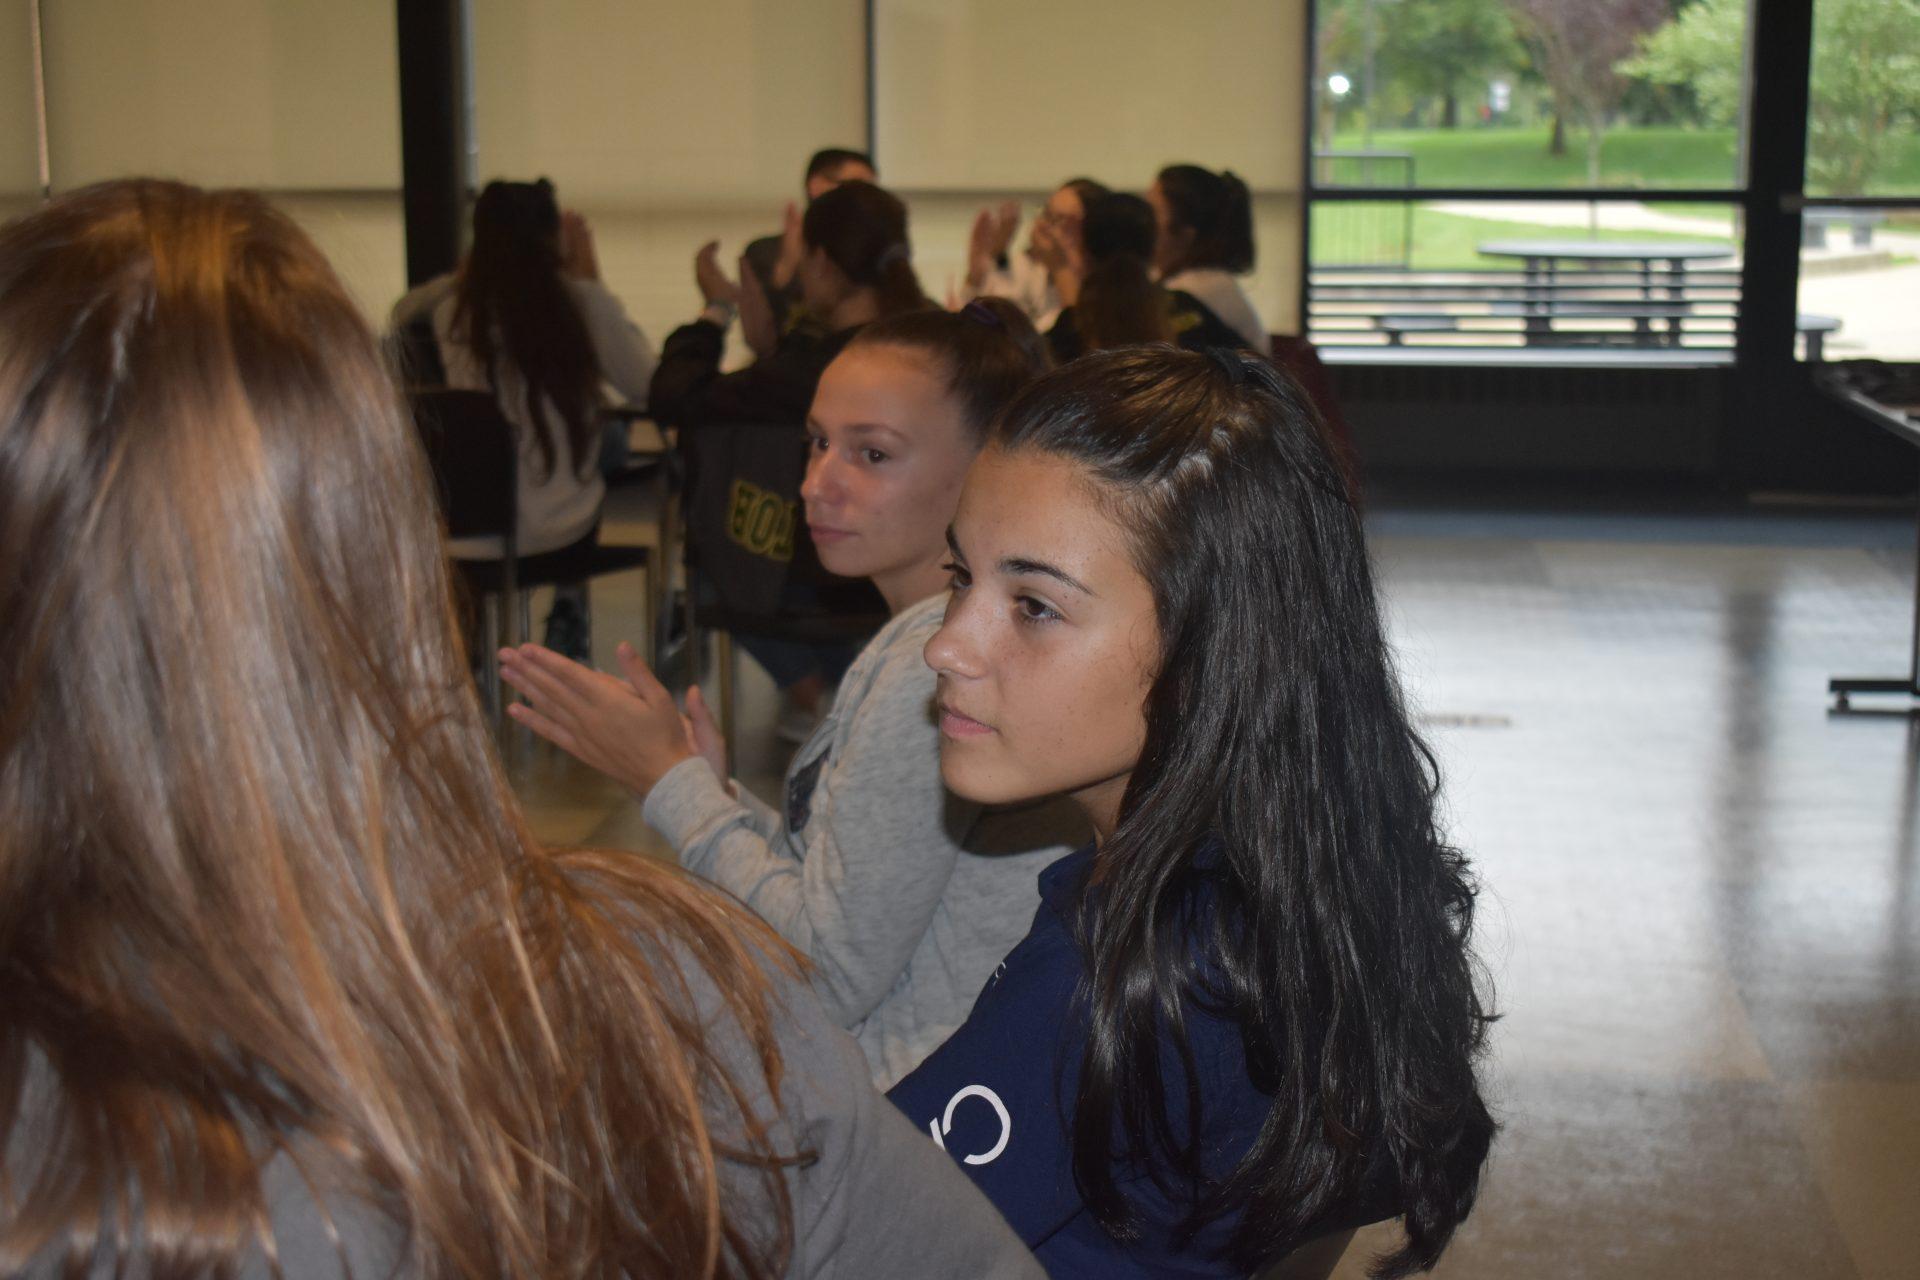 Mentors discussing